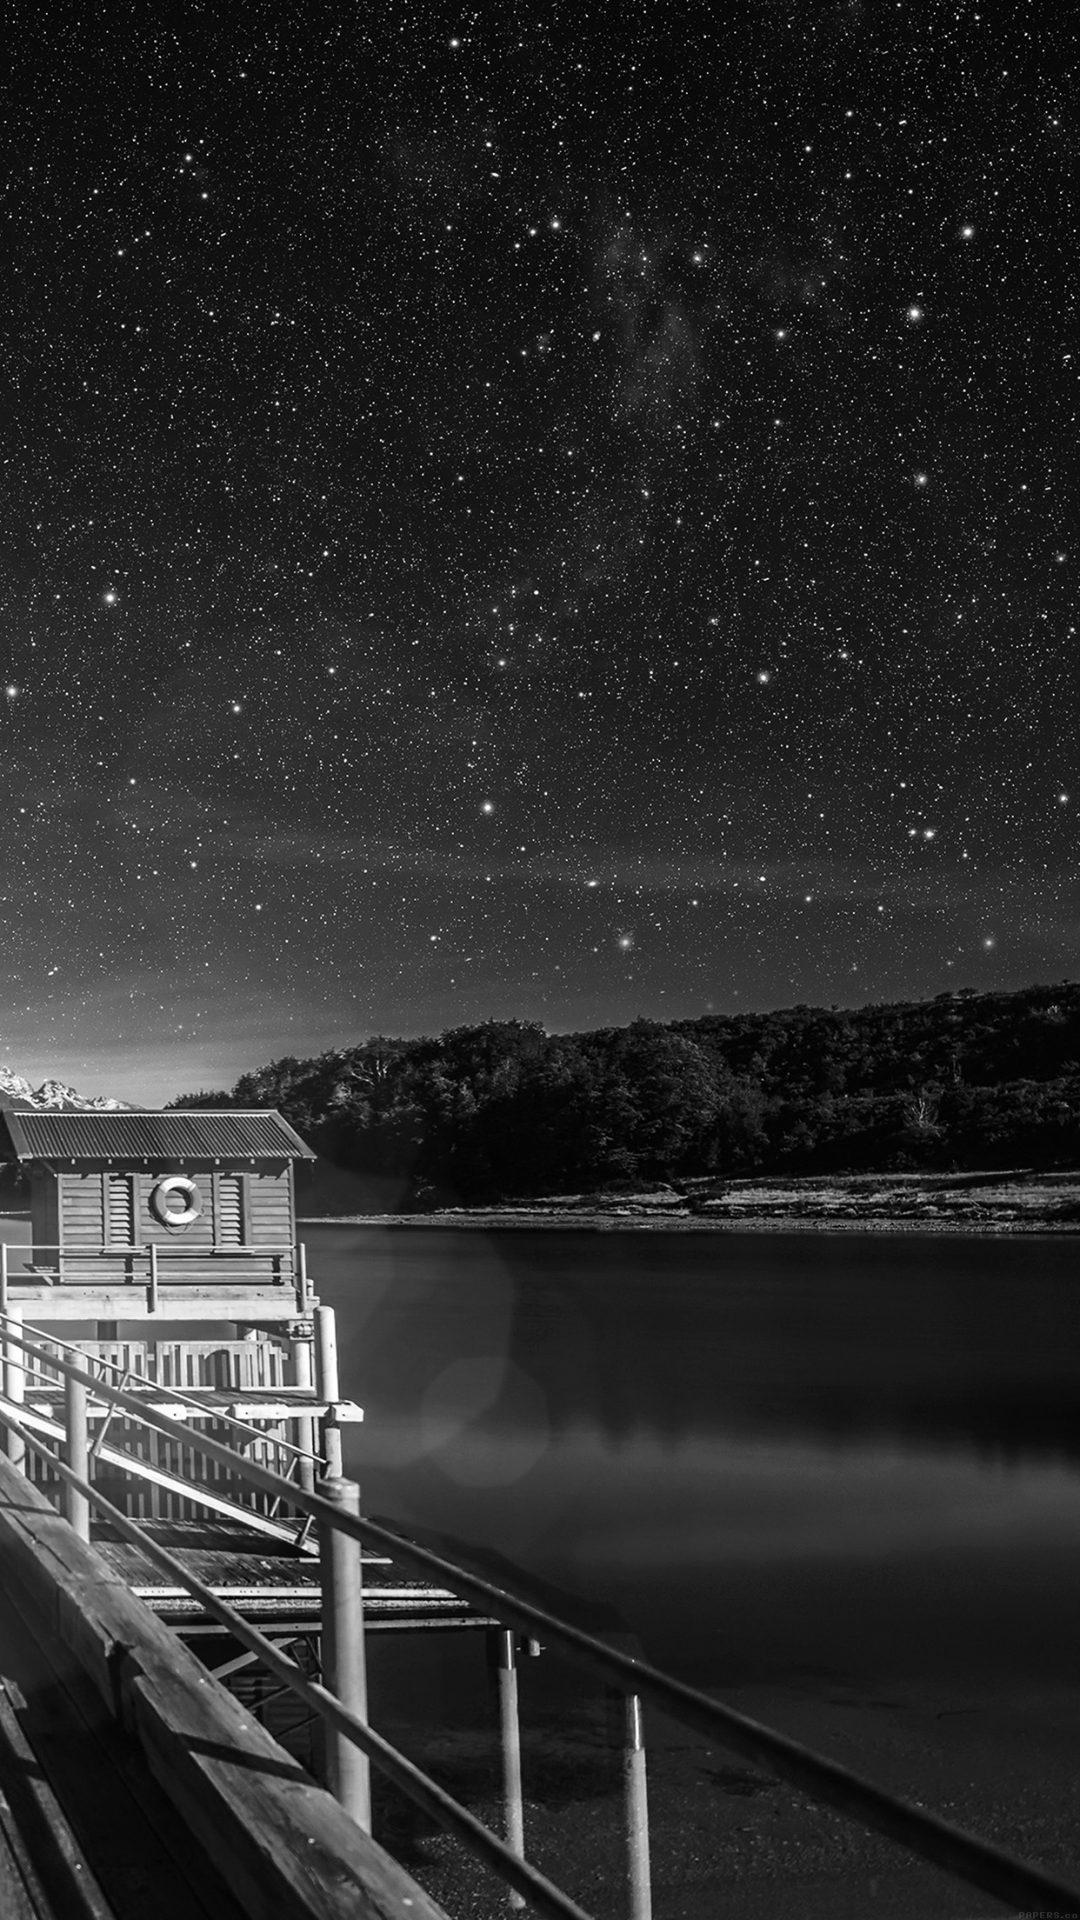 Star Shiny Lake Dark Bw Sky Space Boat Flare